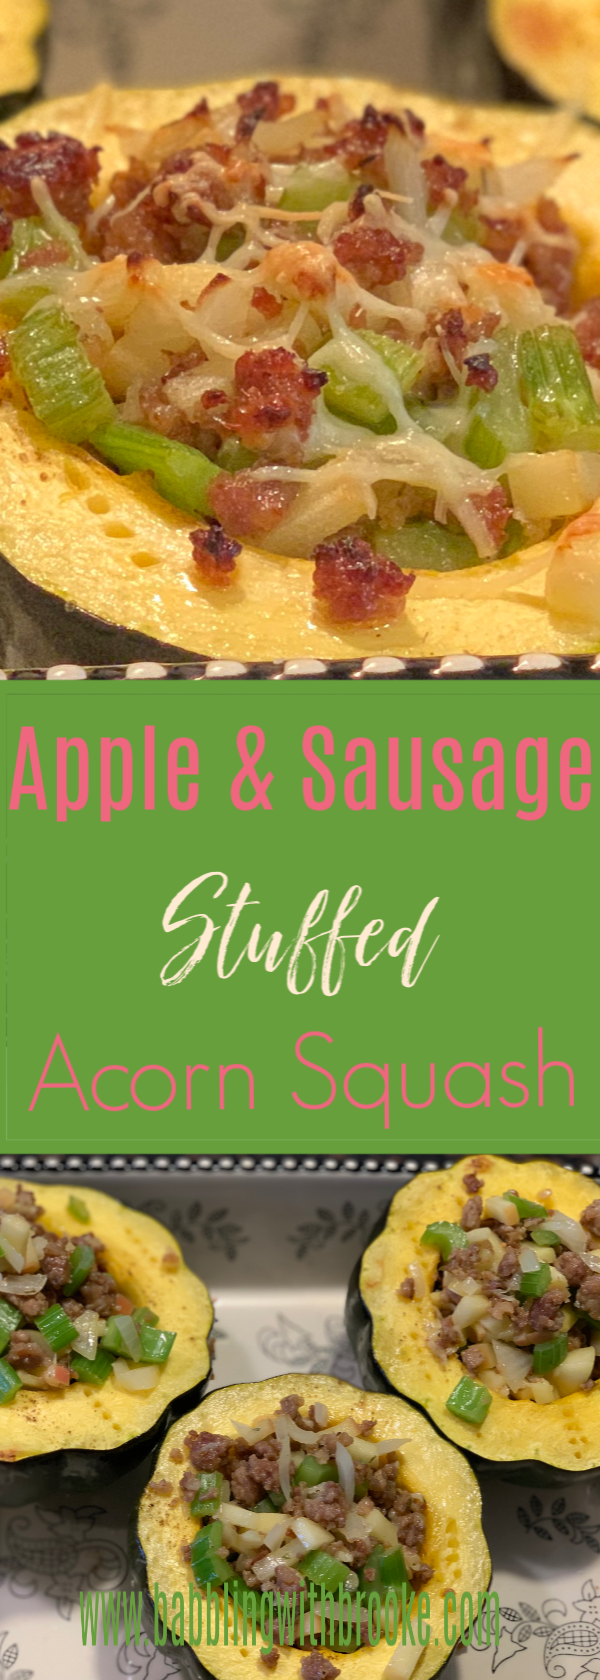 Sausage and Apple Stuffed Acorn Squash   Easy Dinner Recipe